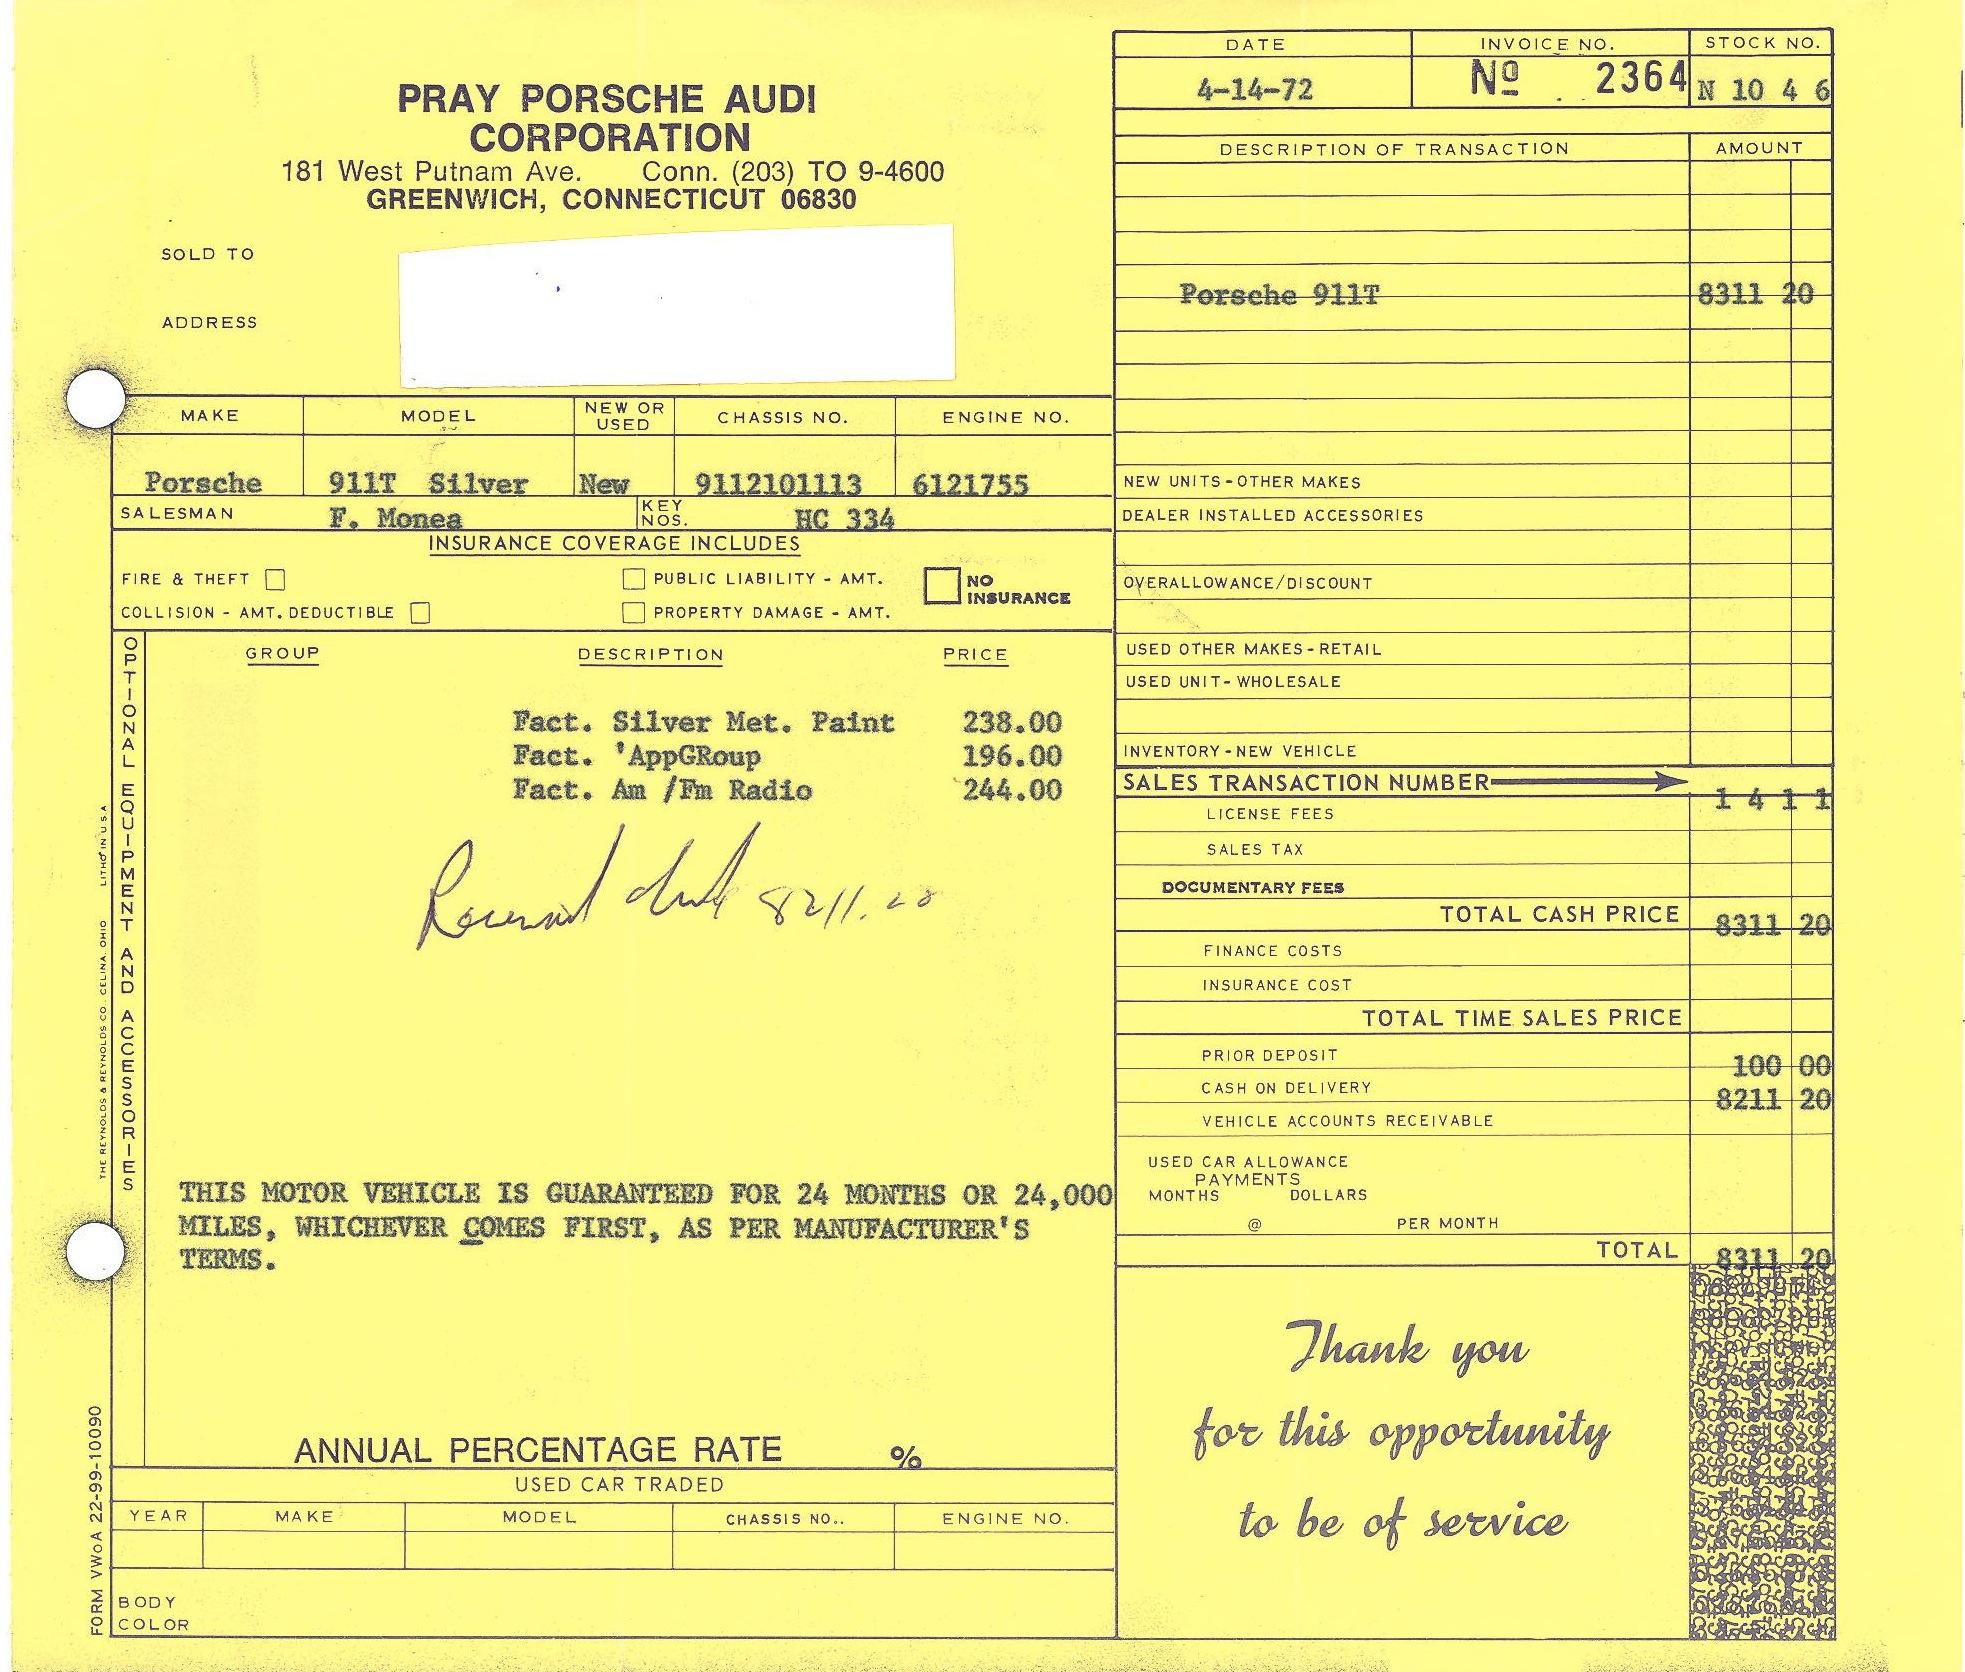 911 Ferrari Craft 1972 Porsche Wiring Harness Invoice For A 911t